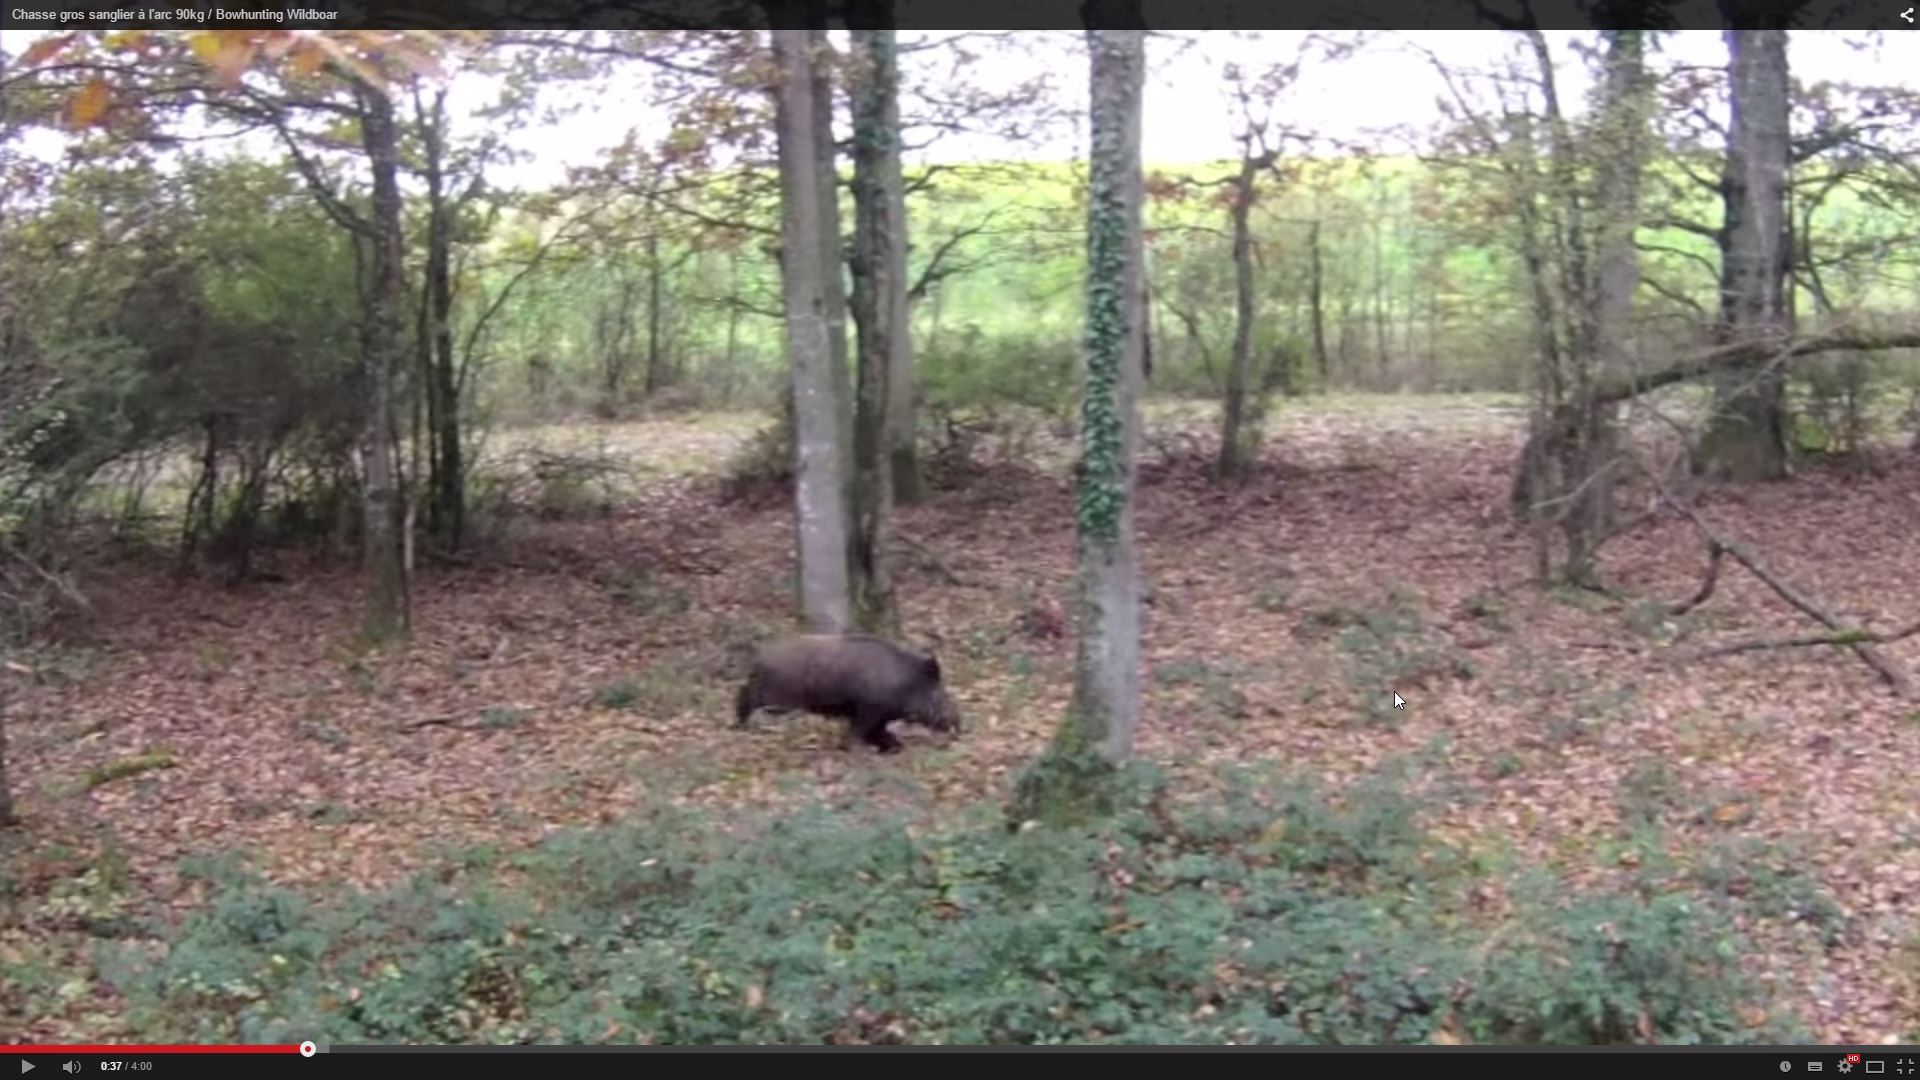 arc 90kg _ Bowhunting Wildboar - YouTube